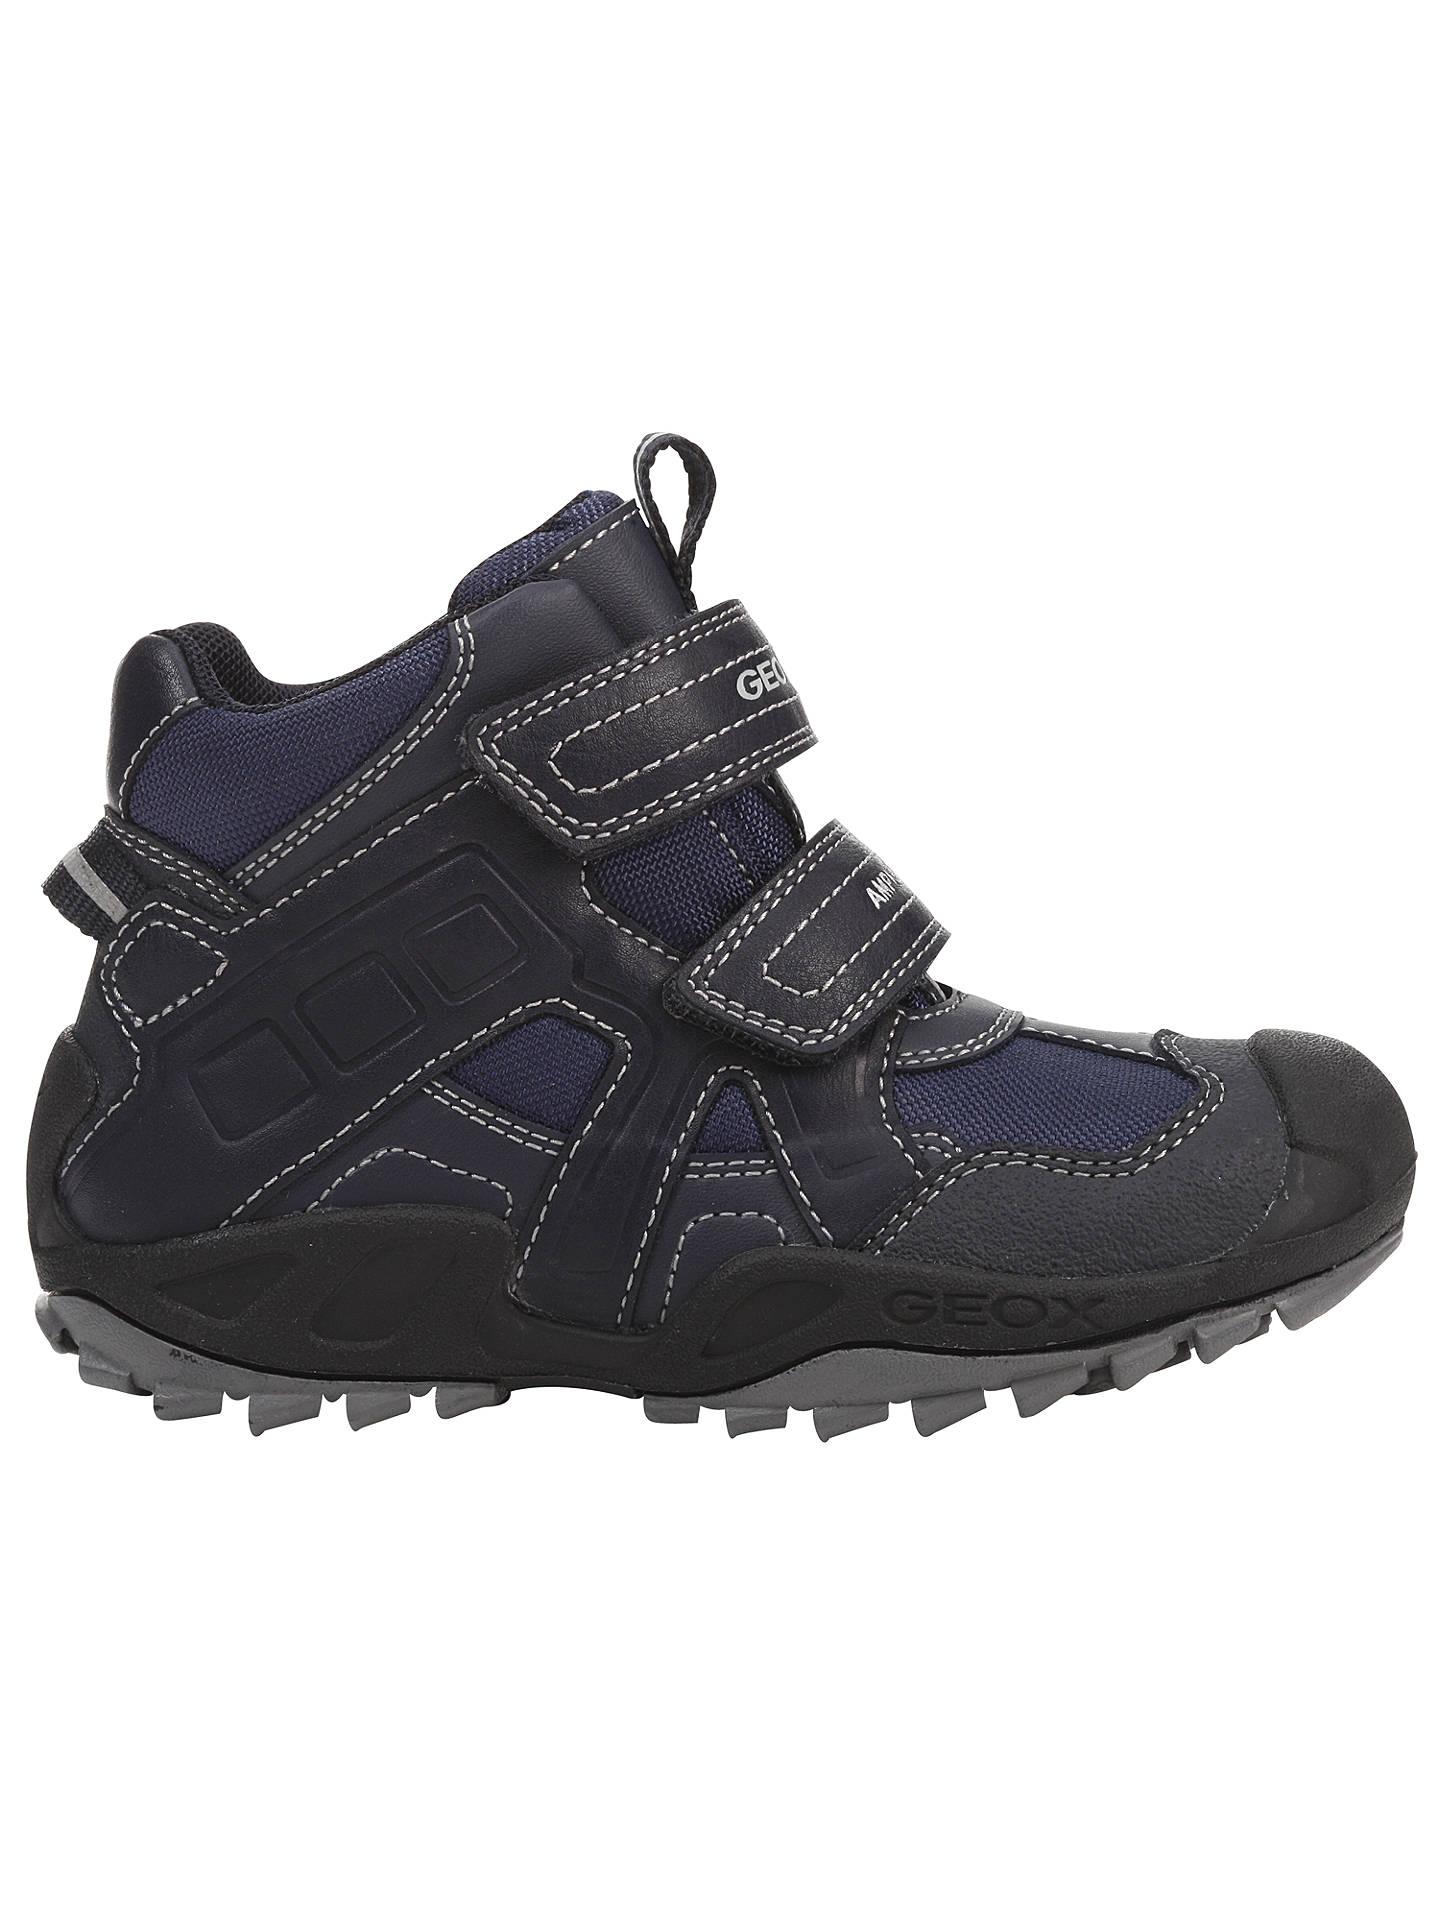 geox childrens shoes usa, Geox new savage trainers grey